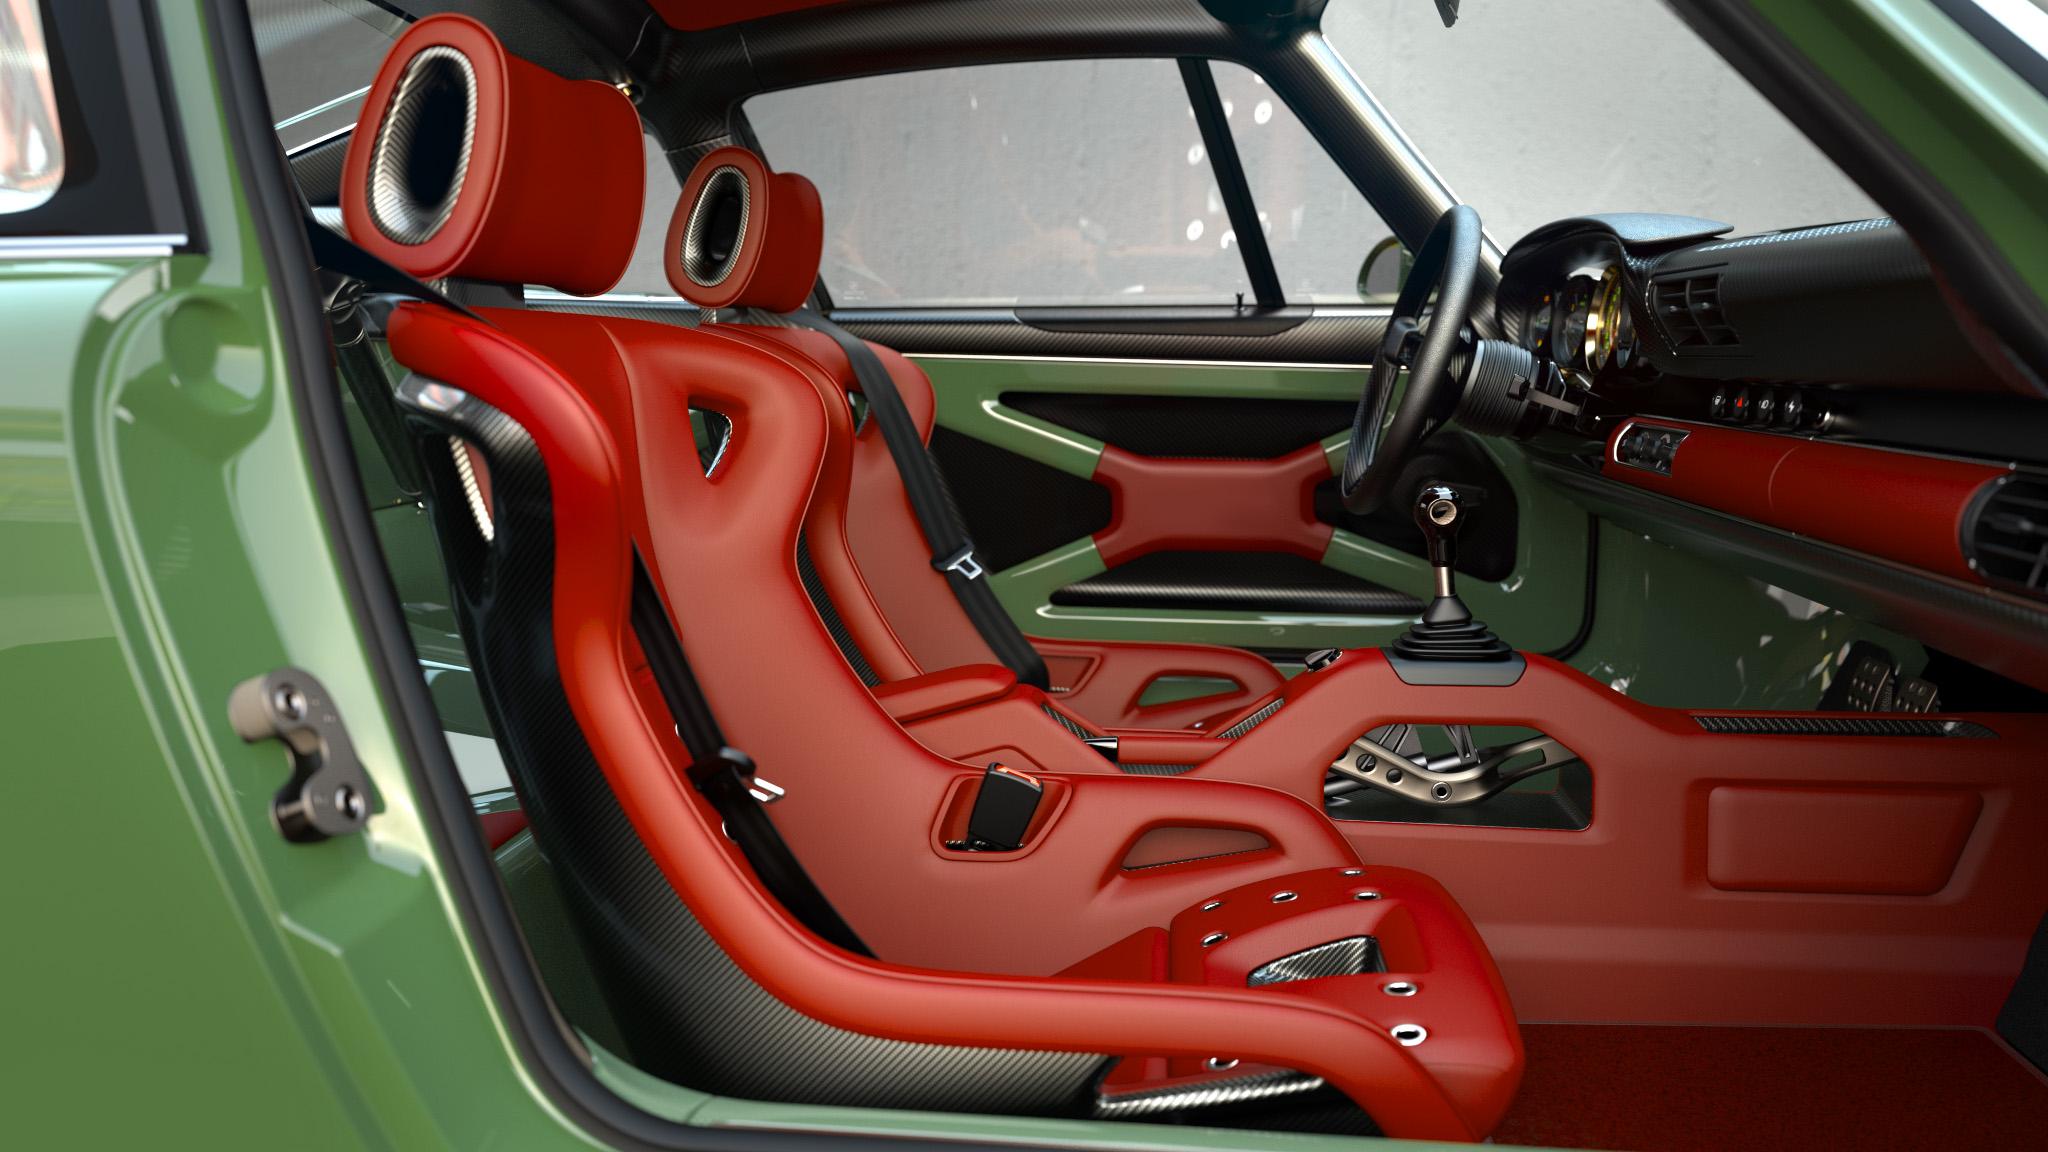 1990 Porsche 911 interior right door straight